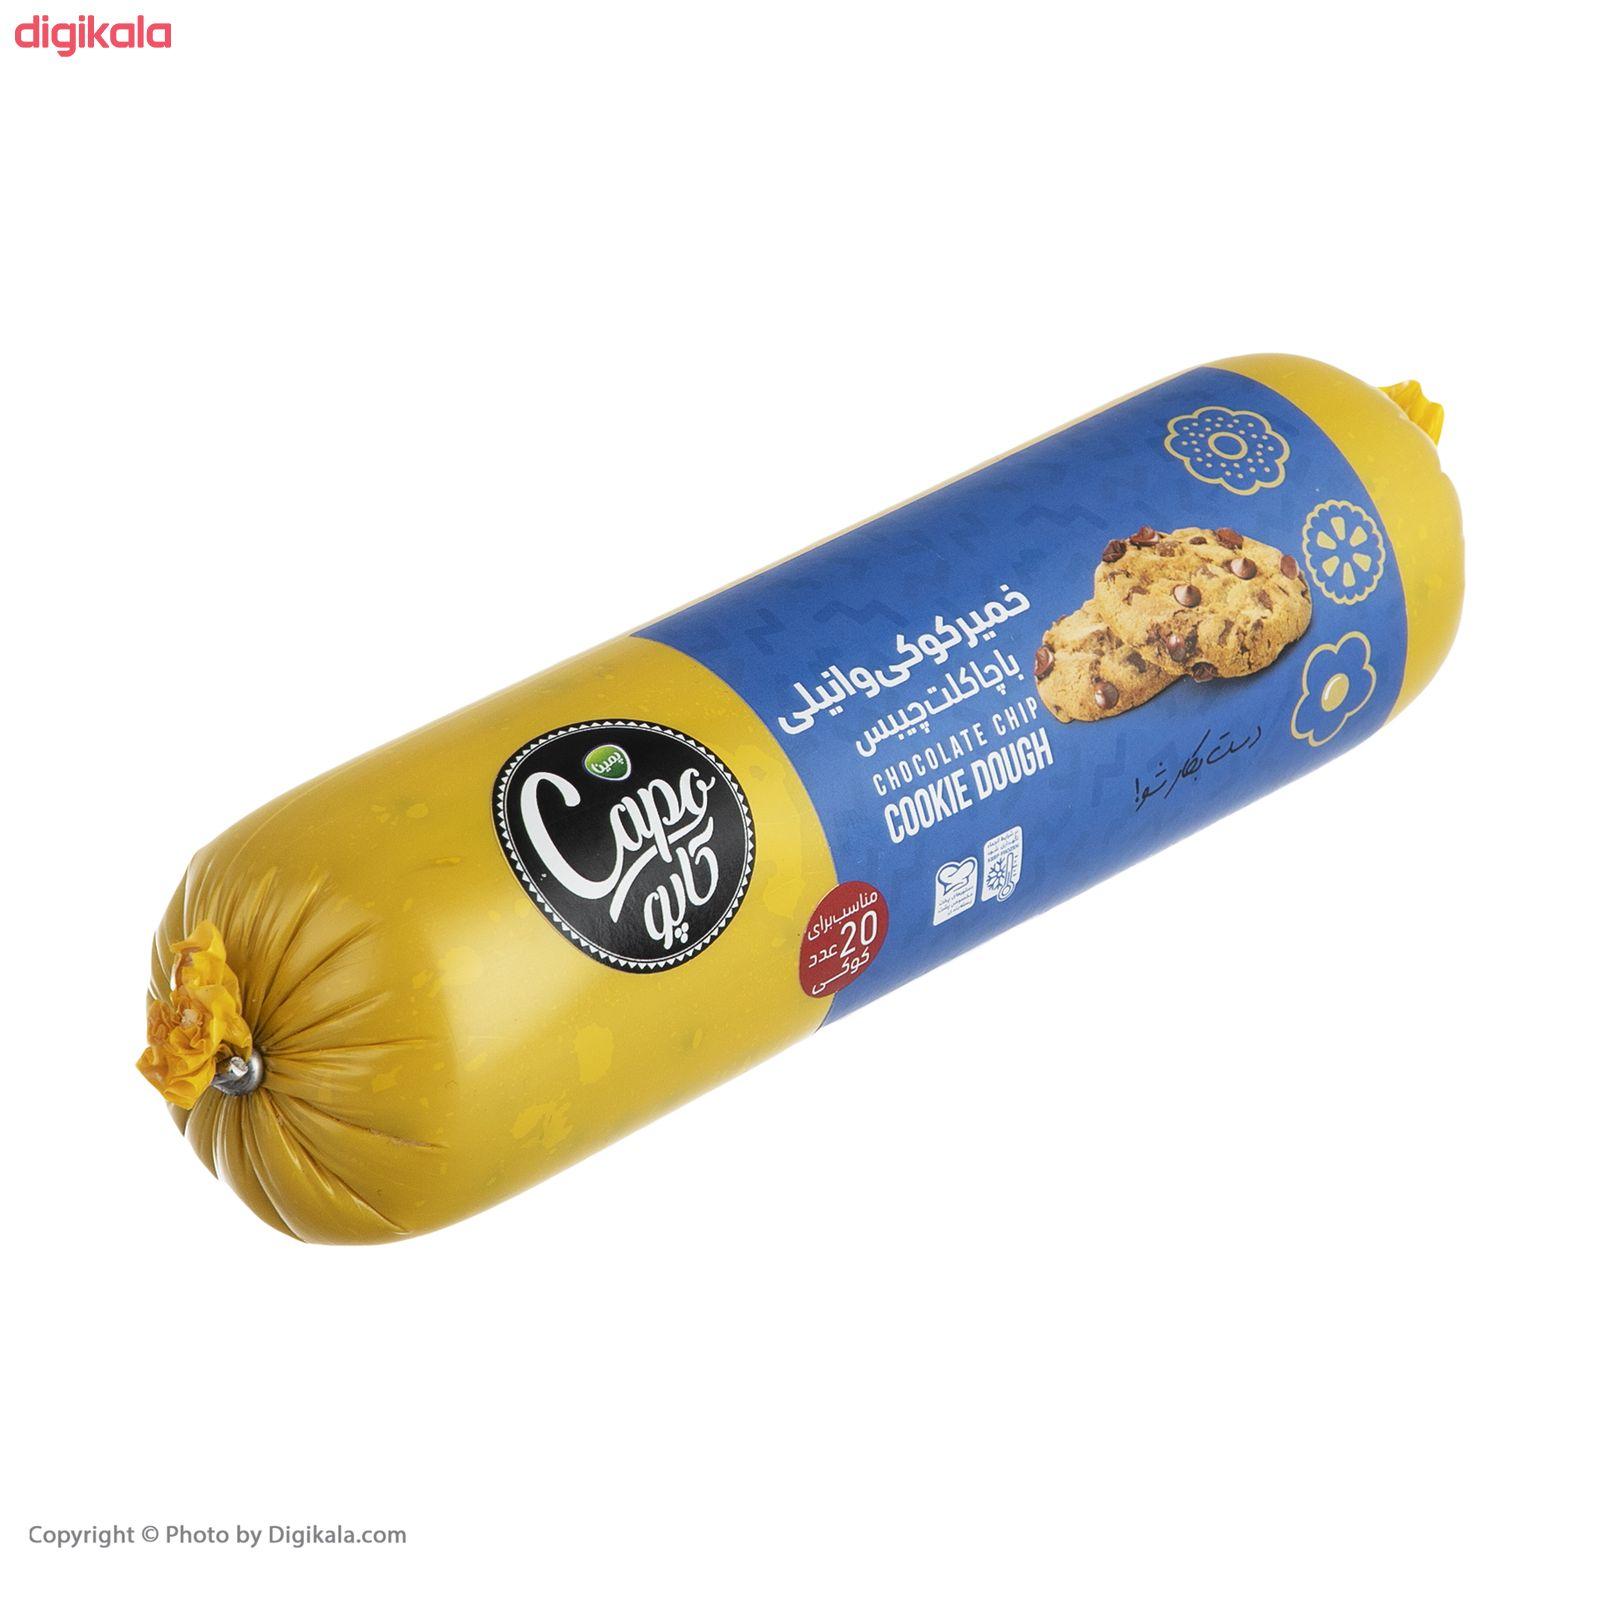 خمیر کوکی وانیلی پمینا با پاکلت چیبس - 570 گرم   main 1 3